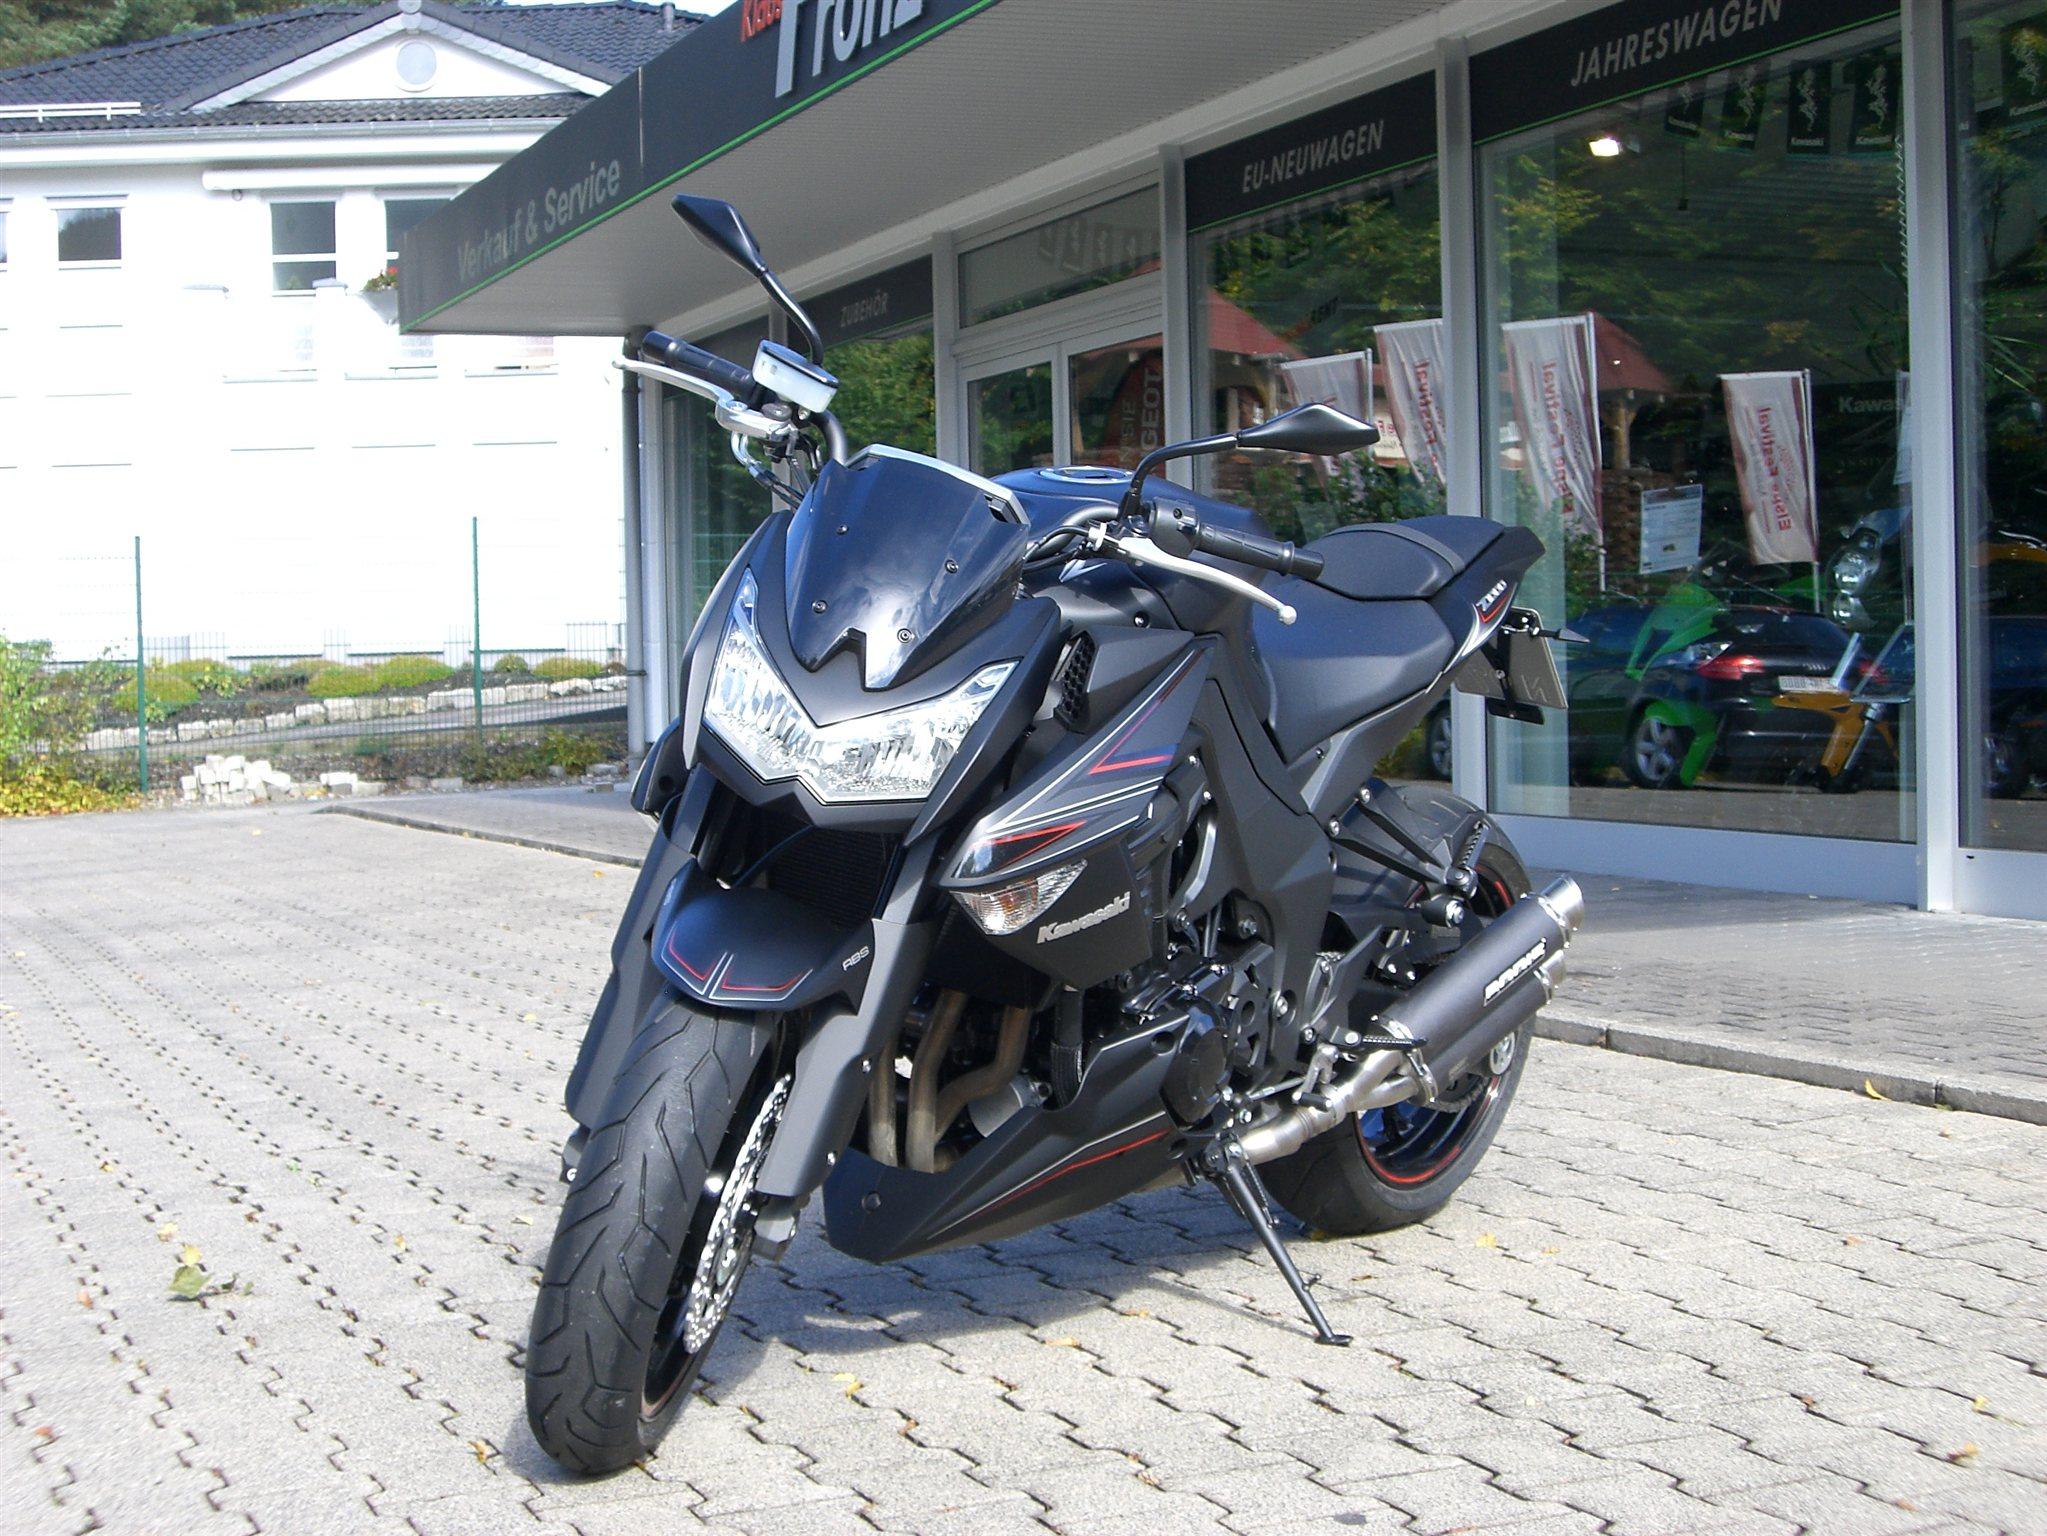 Umgebautes Motorrad Kawasaki Z1000 von BikerWorld Rosenow